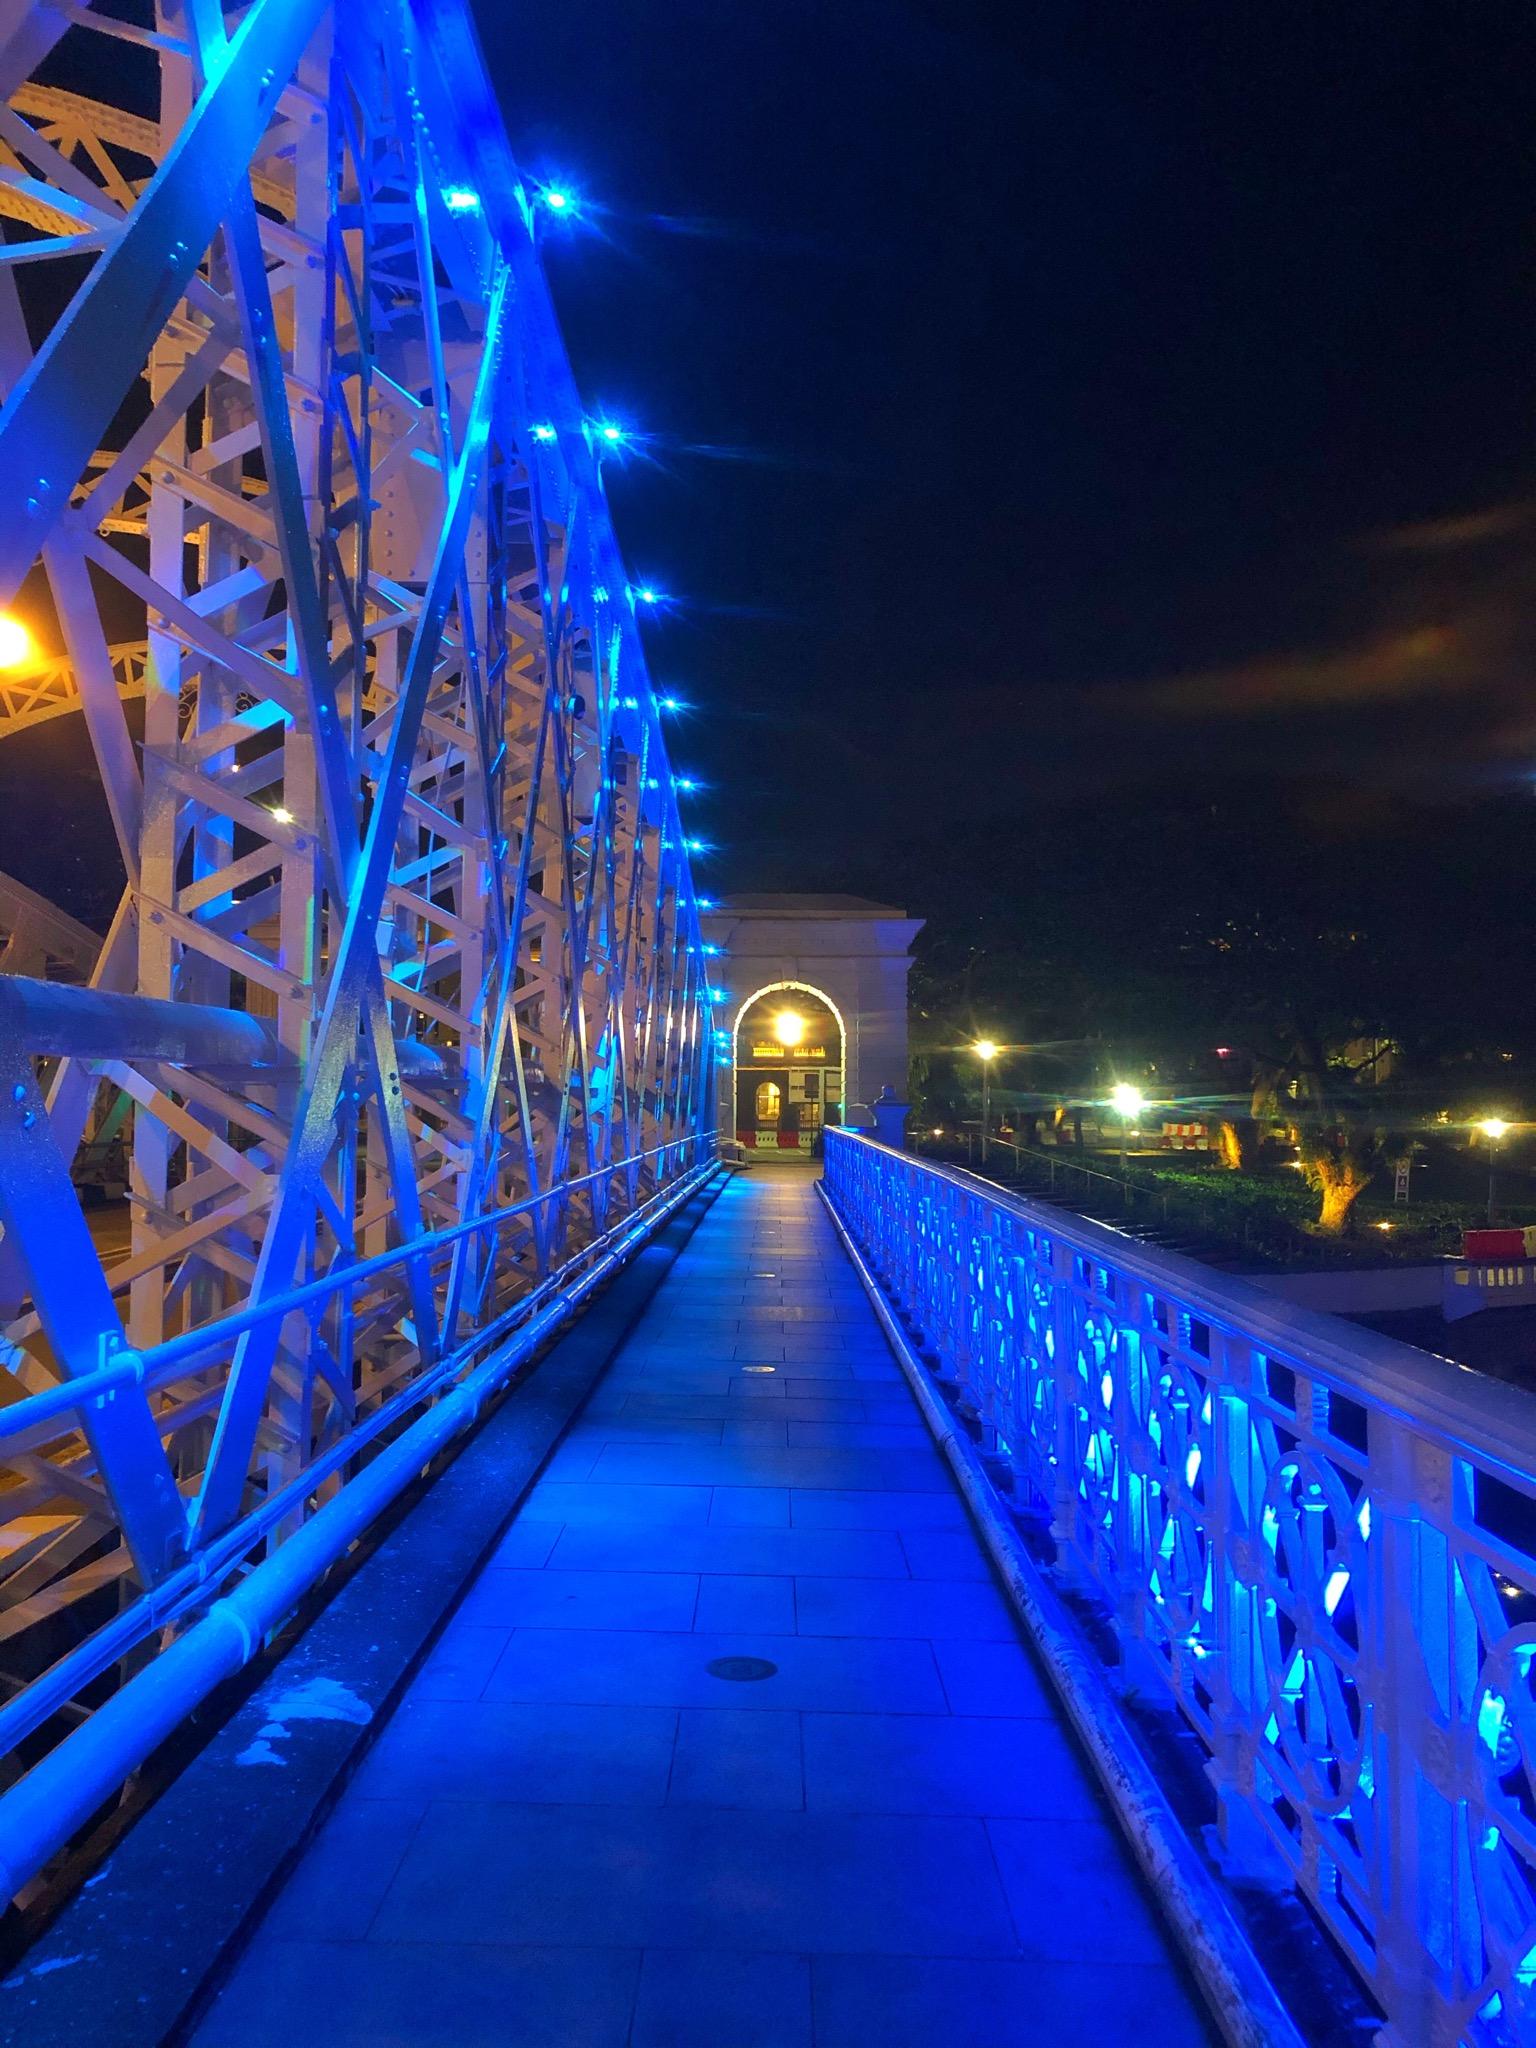 Anderson Bridge Singapore at night